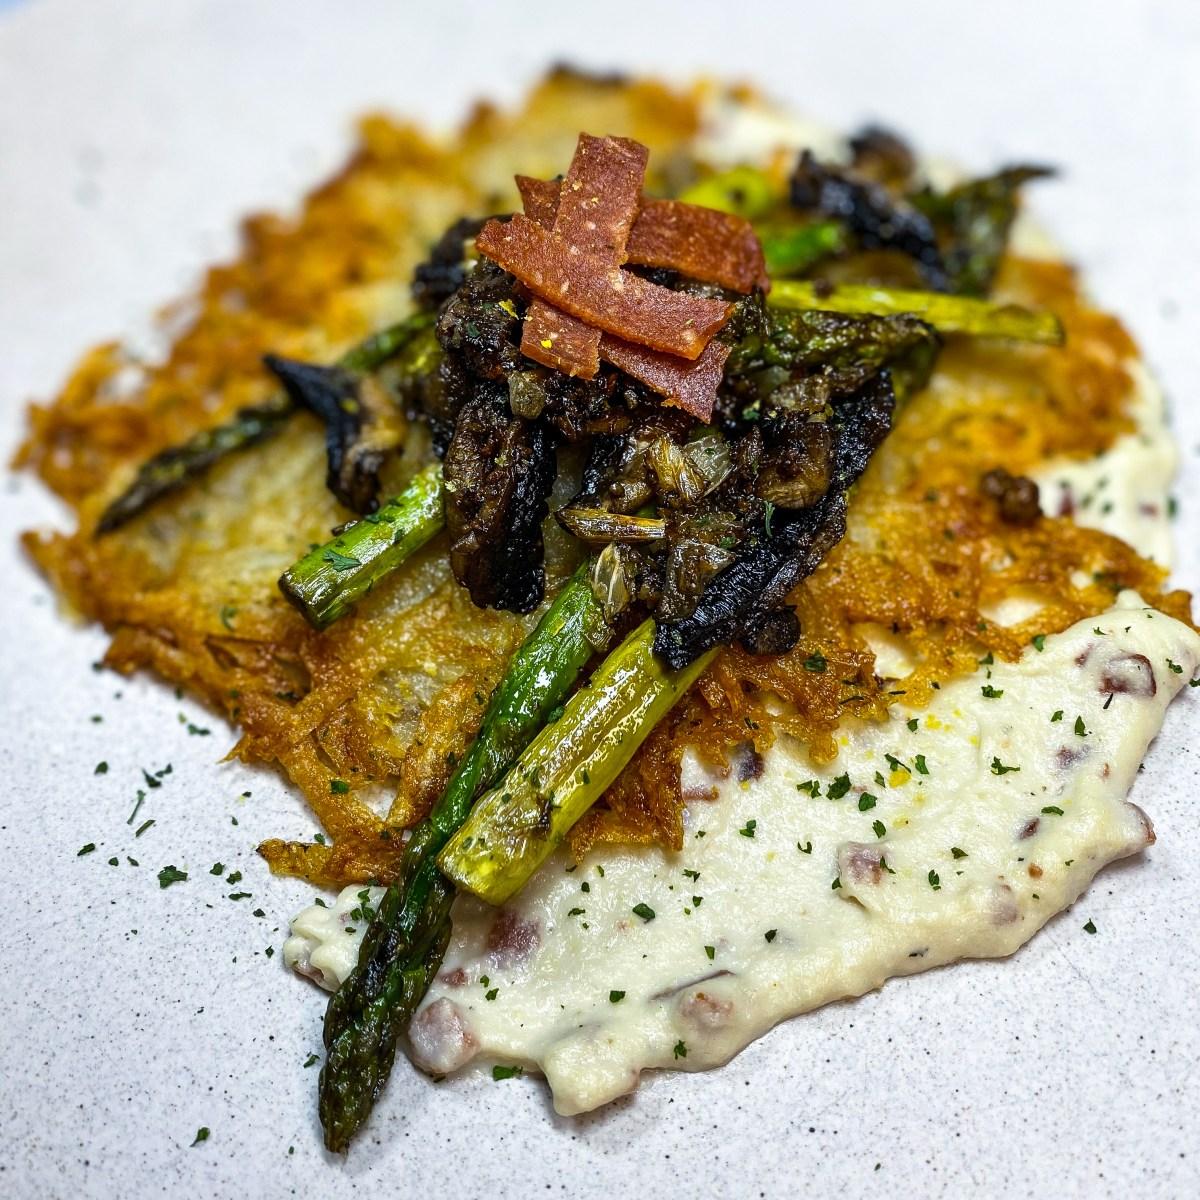 Asparagus carbonara with vegan bacon on top and piled on a creamy sauce with crispy shredded potatoes.